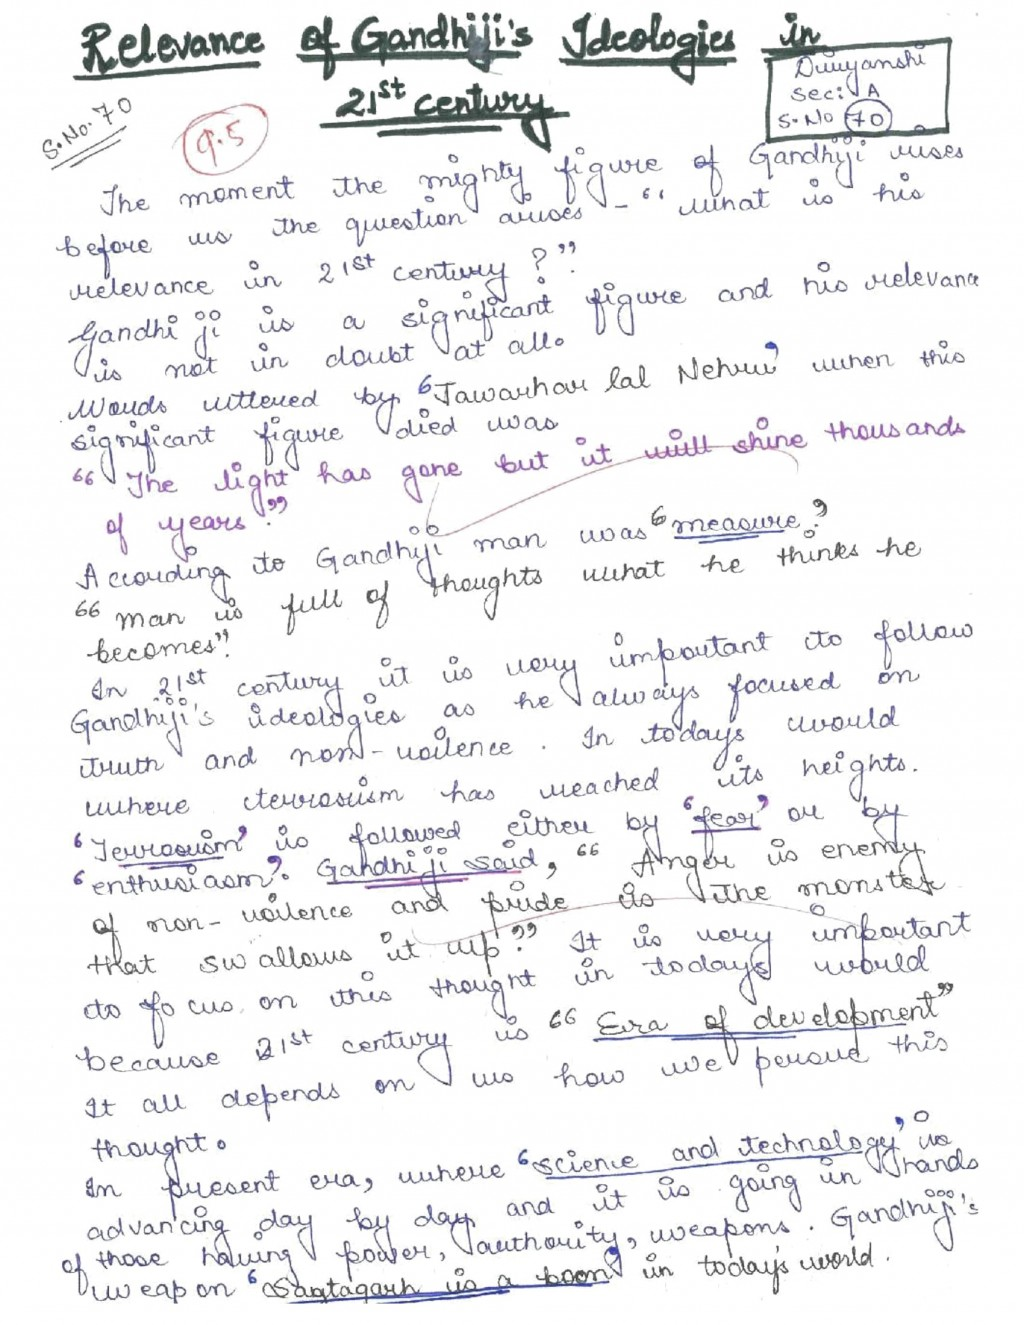 007 Gandhiji Essay Essay1 Sensational Mahatma Gandhi In Gujarati Pdf Free Download Hindi Language Ma Nibandh Large